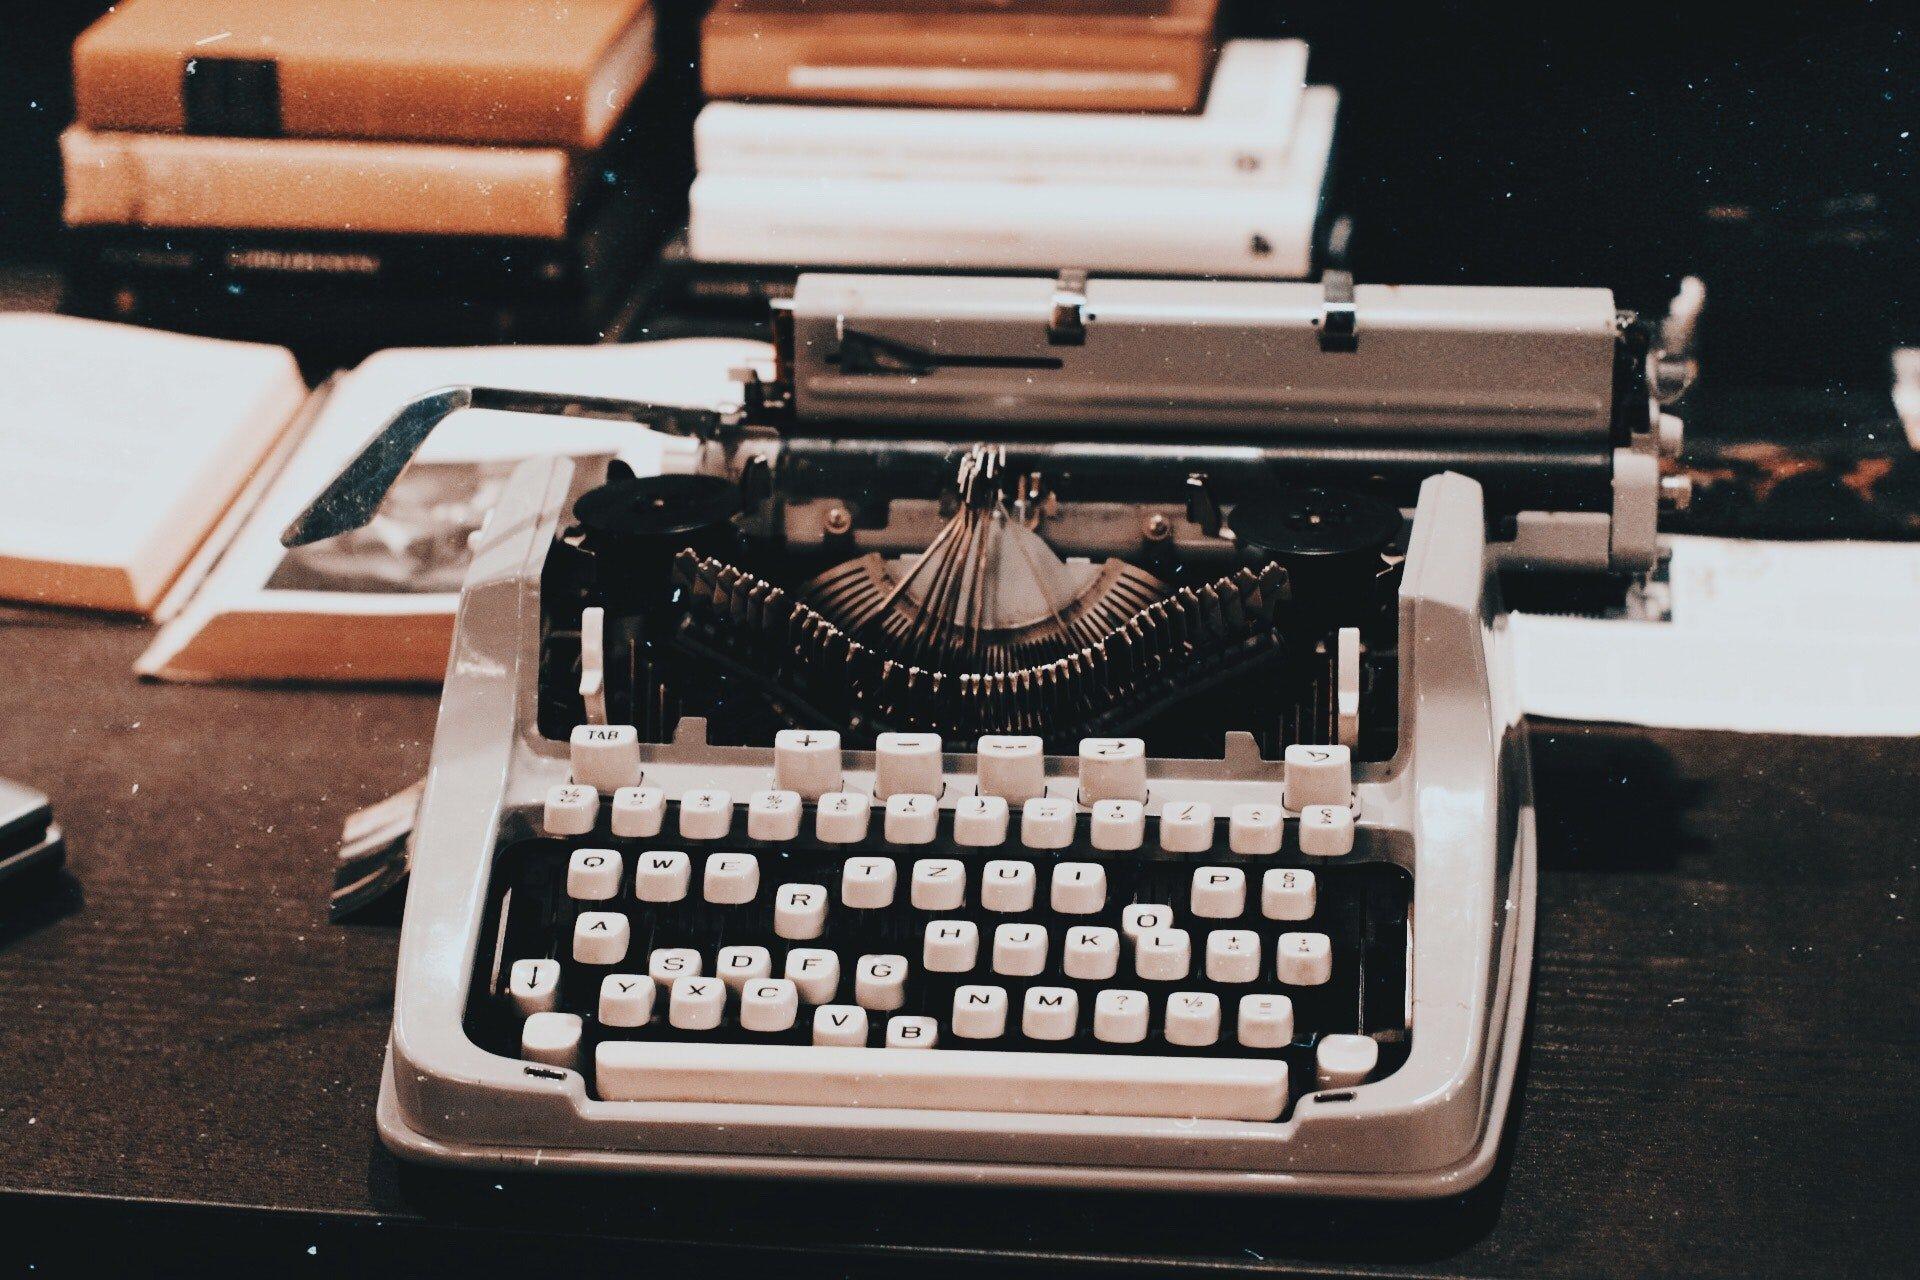 Business Friend Typewriter Image